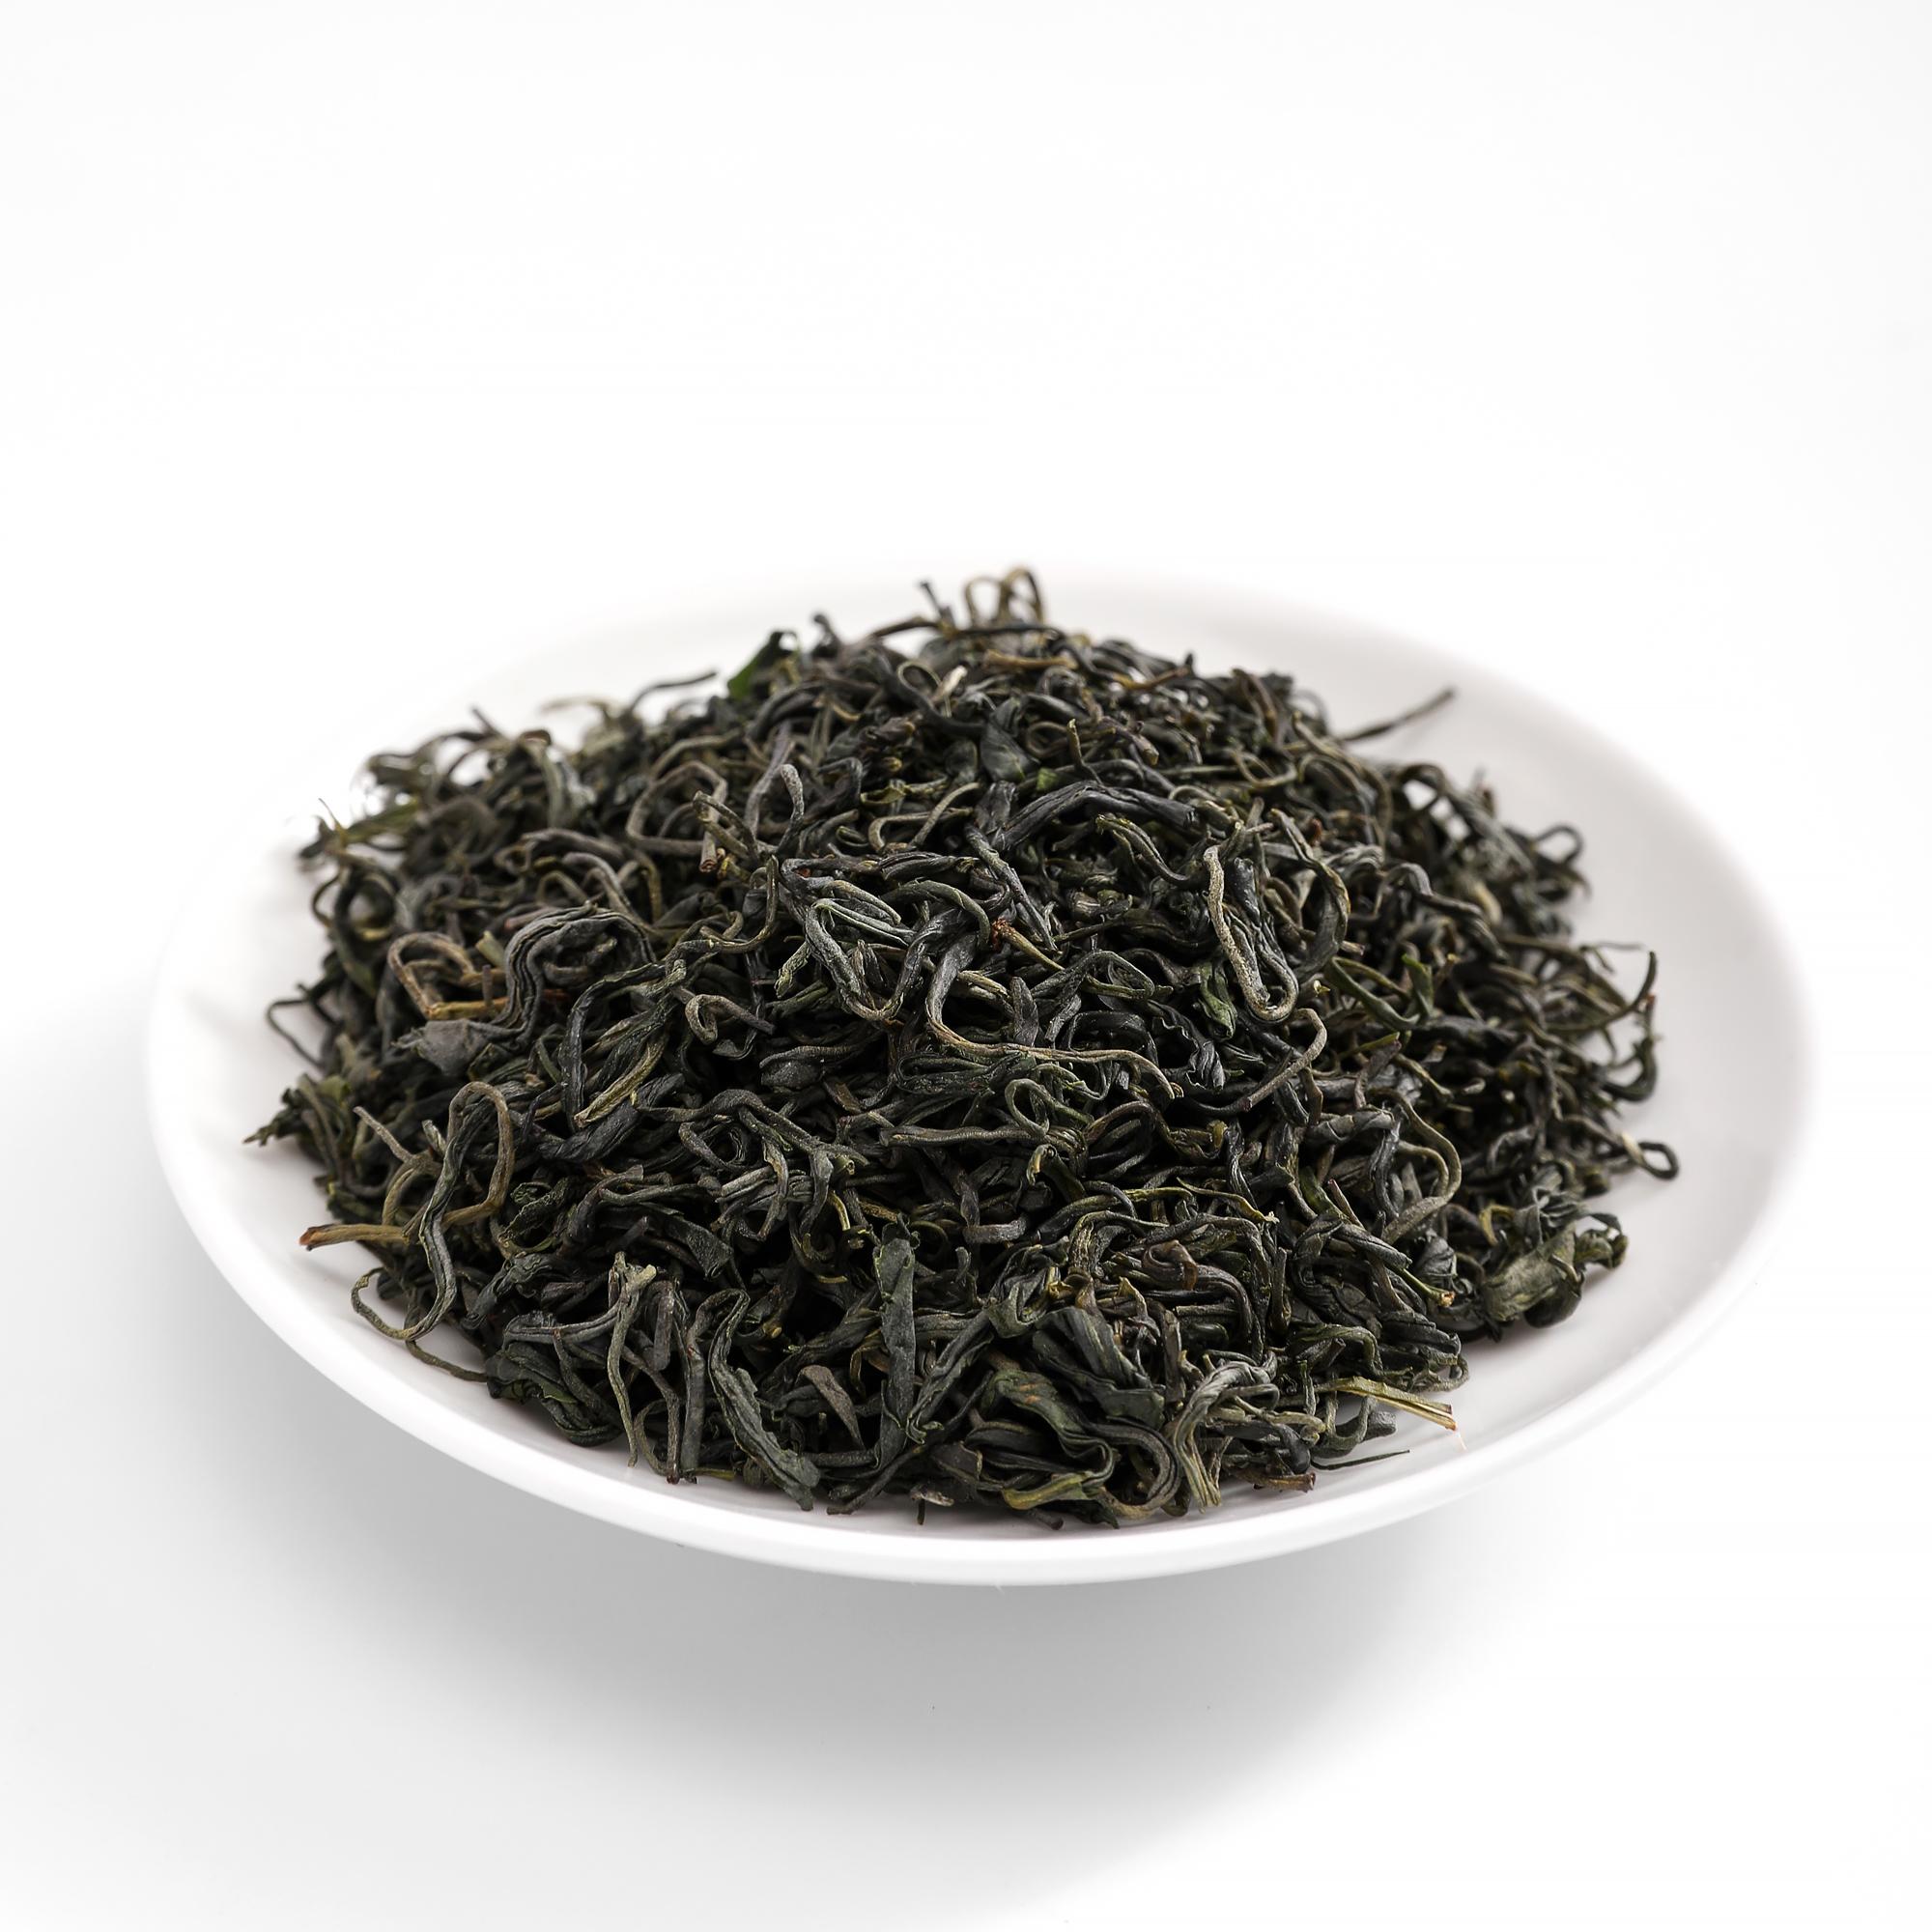 Exporter wholesale For Pure Natural Fragrant Green Tea With Reasonable Price - 4uTea | 4uTea.com